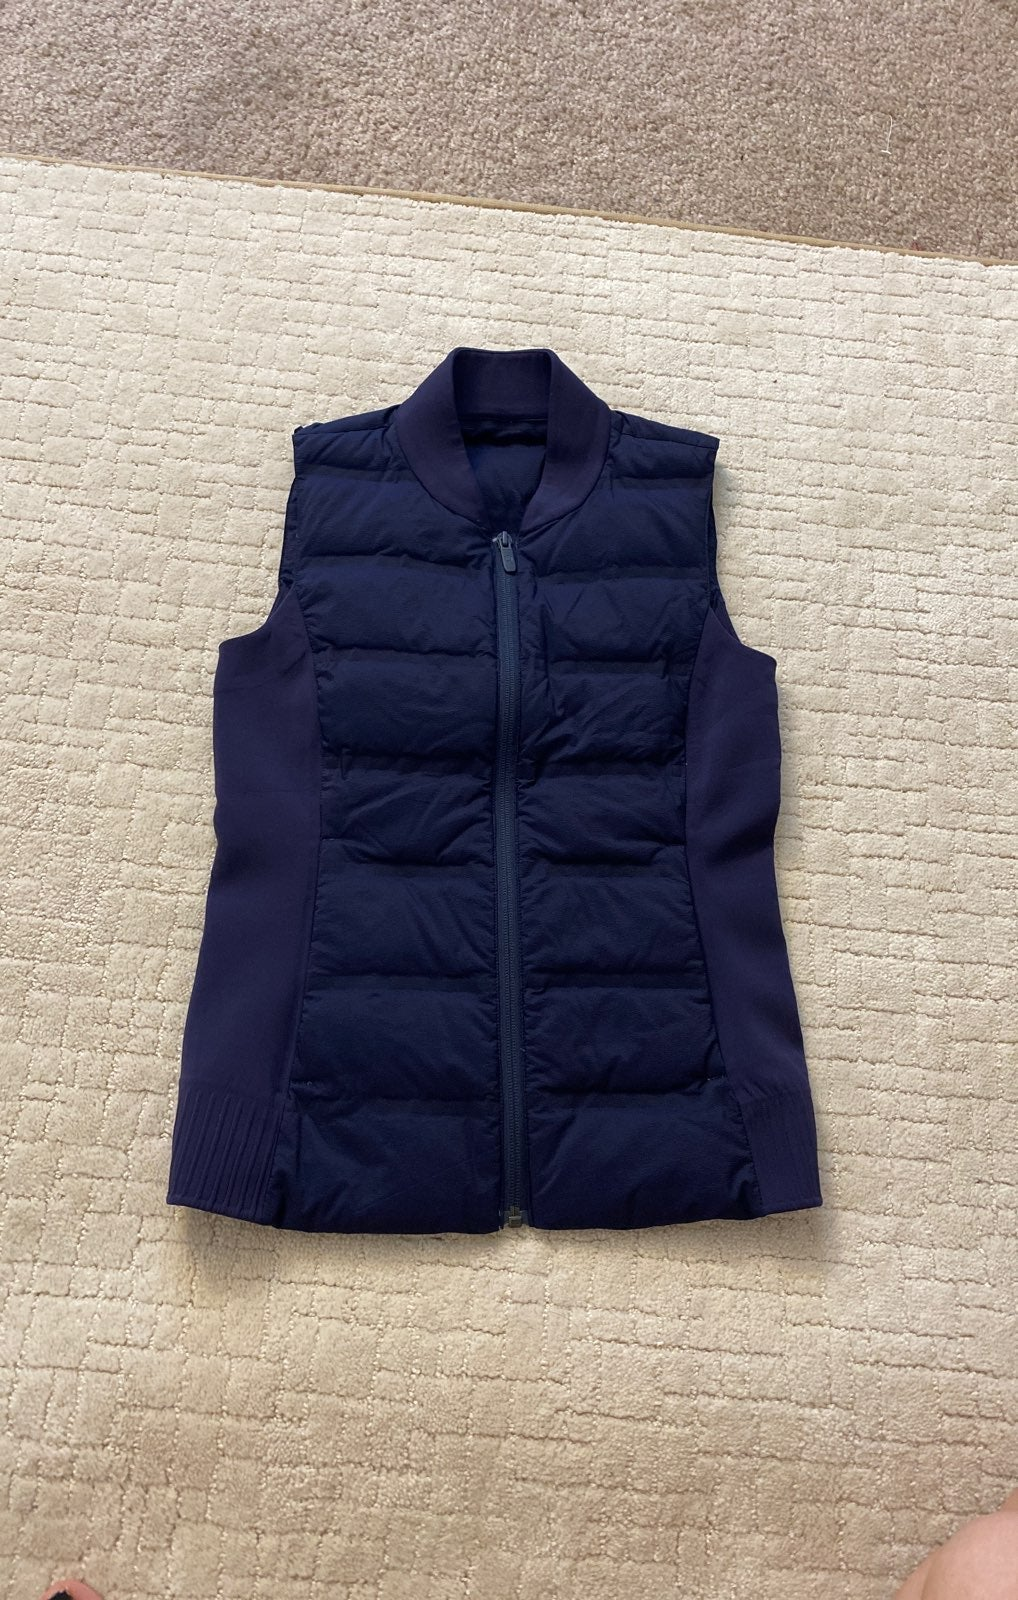 Lululemon Vest Size 2 NWOT